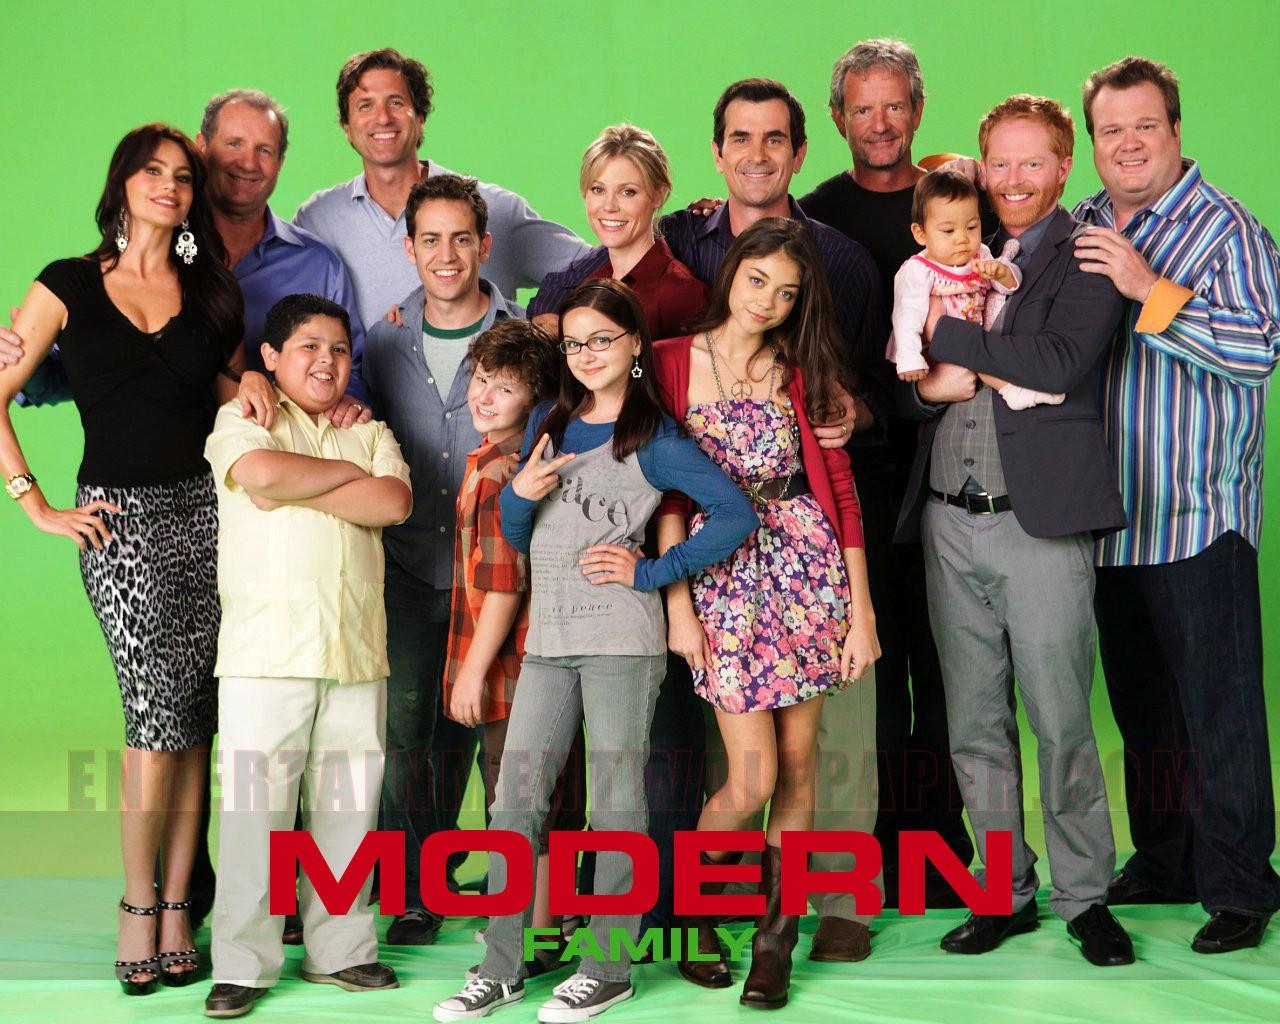 HD Wallpapers | Desktop Wallpapers 1080p: Modern Family ...